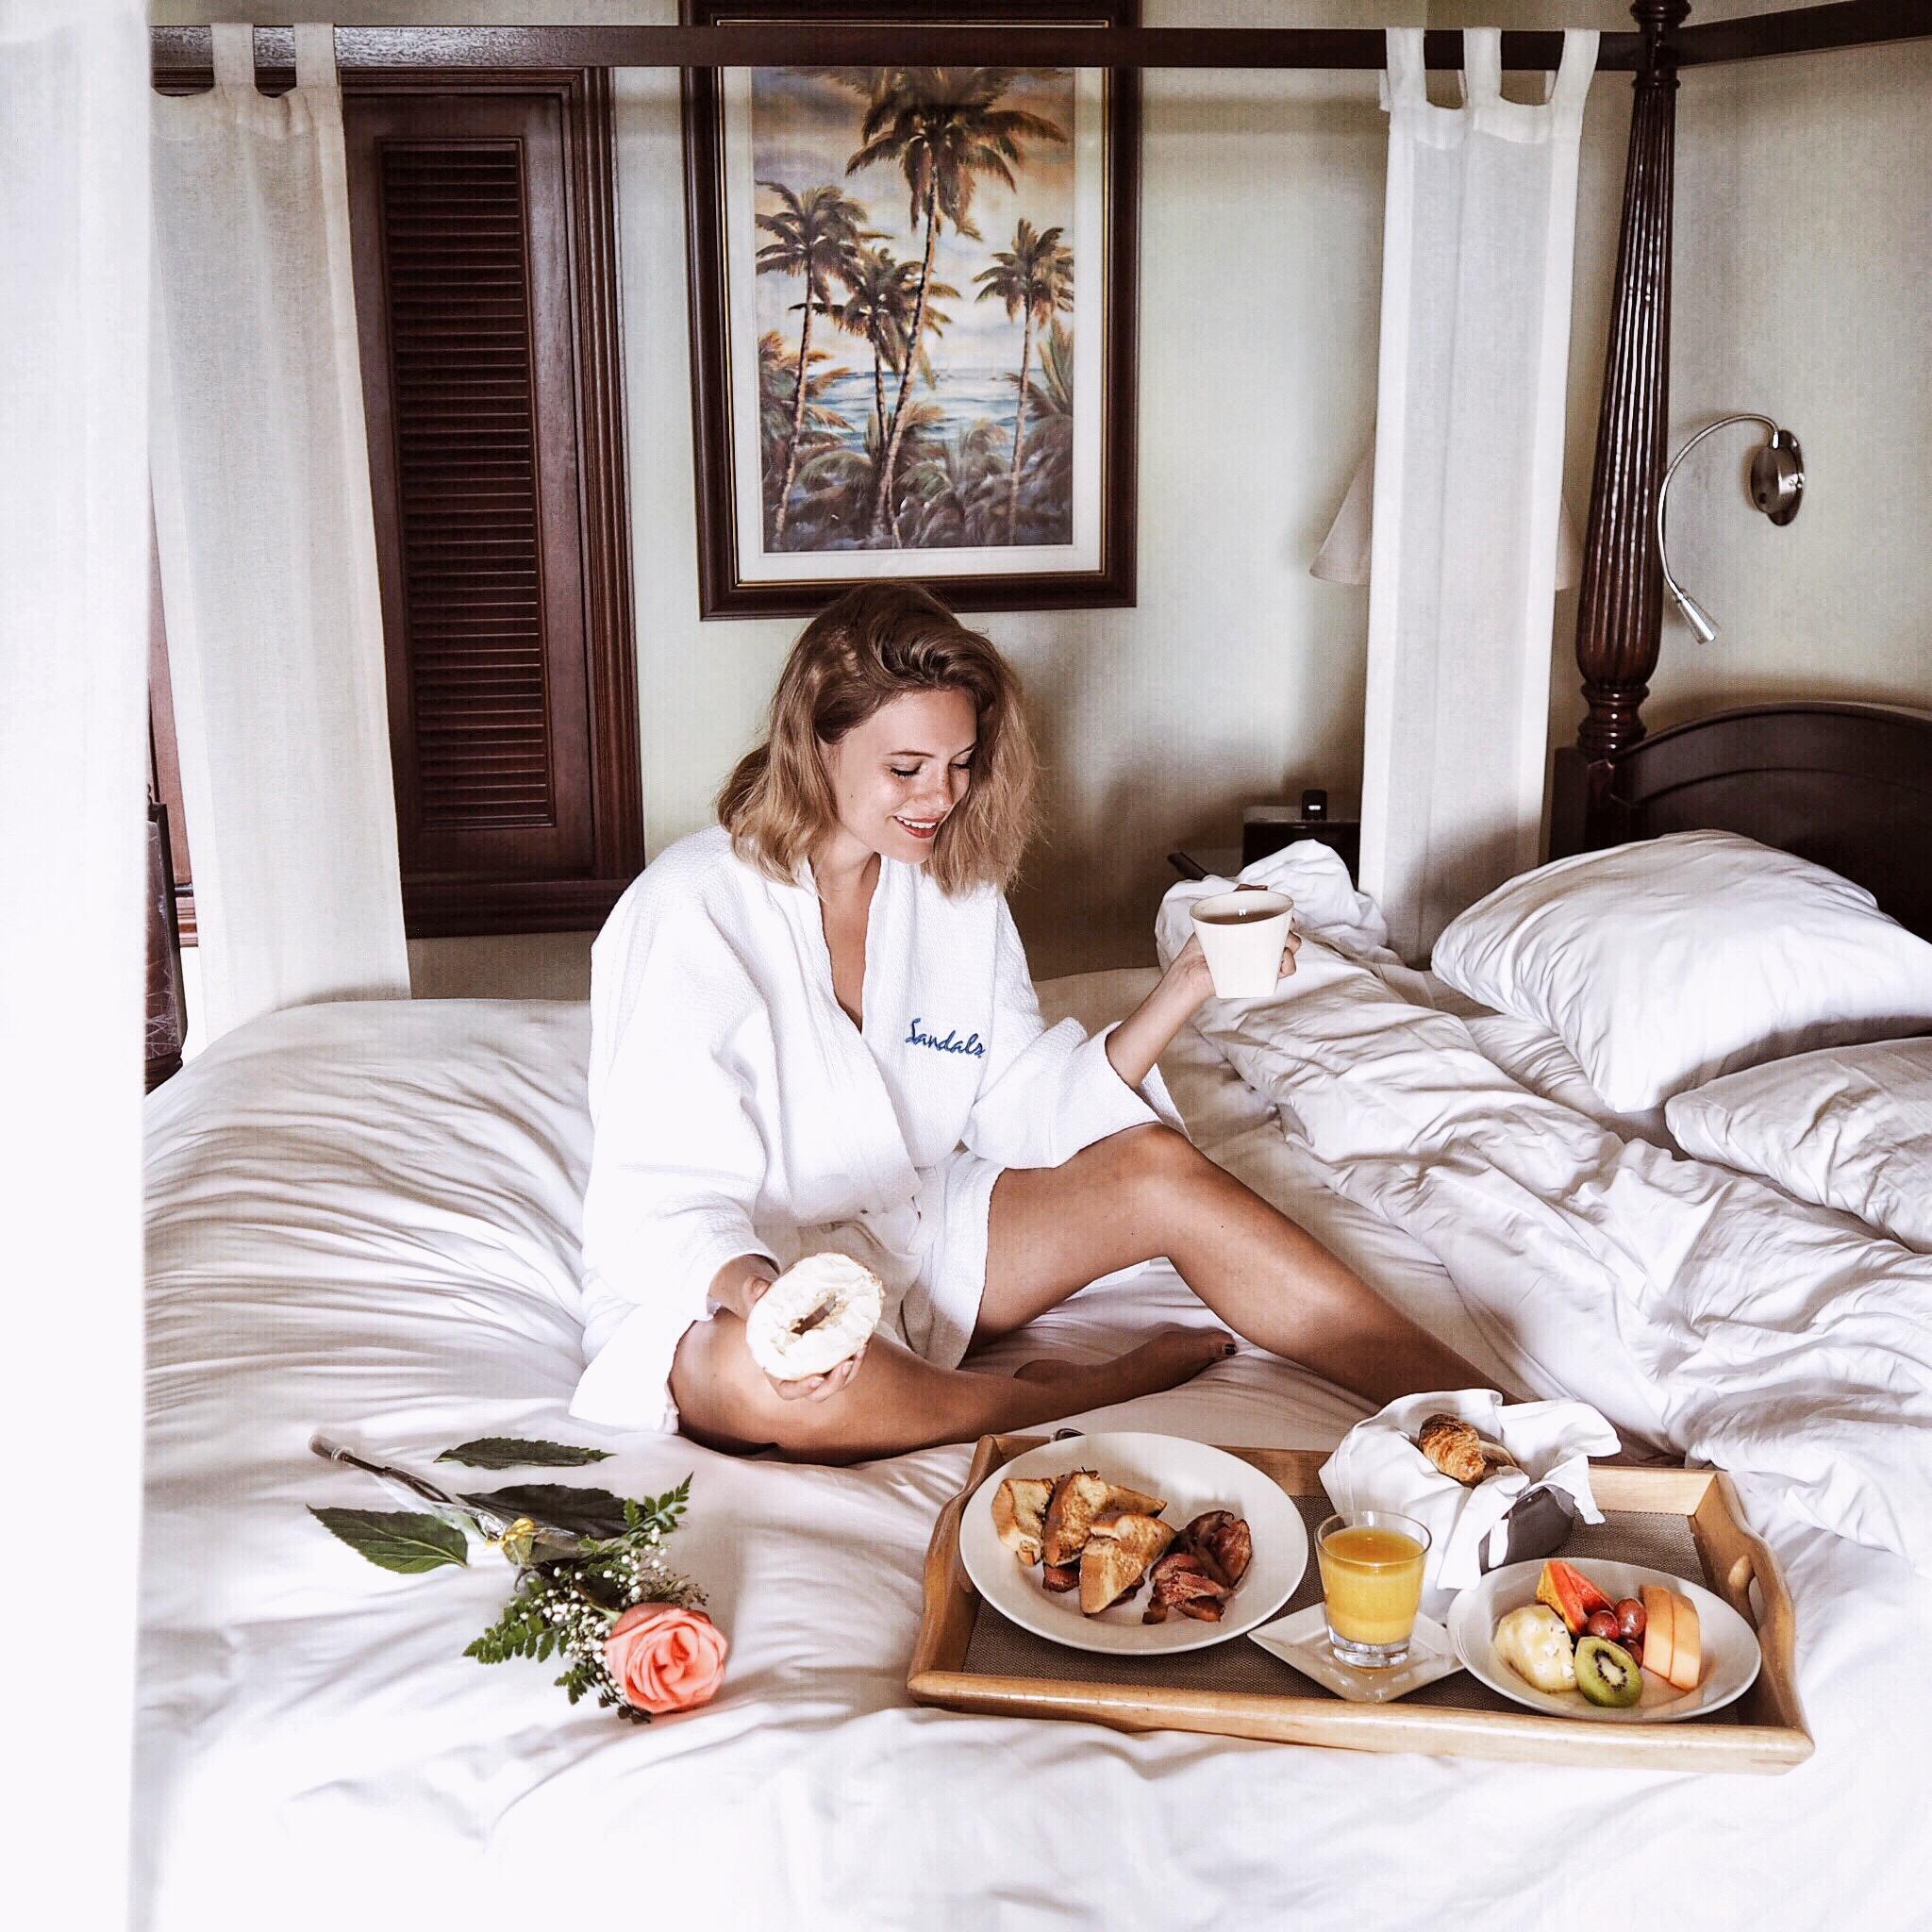 sandals resort montego bay jesschamilton breakfast in bed